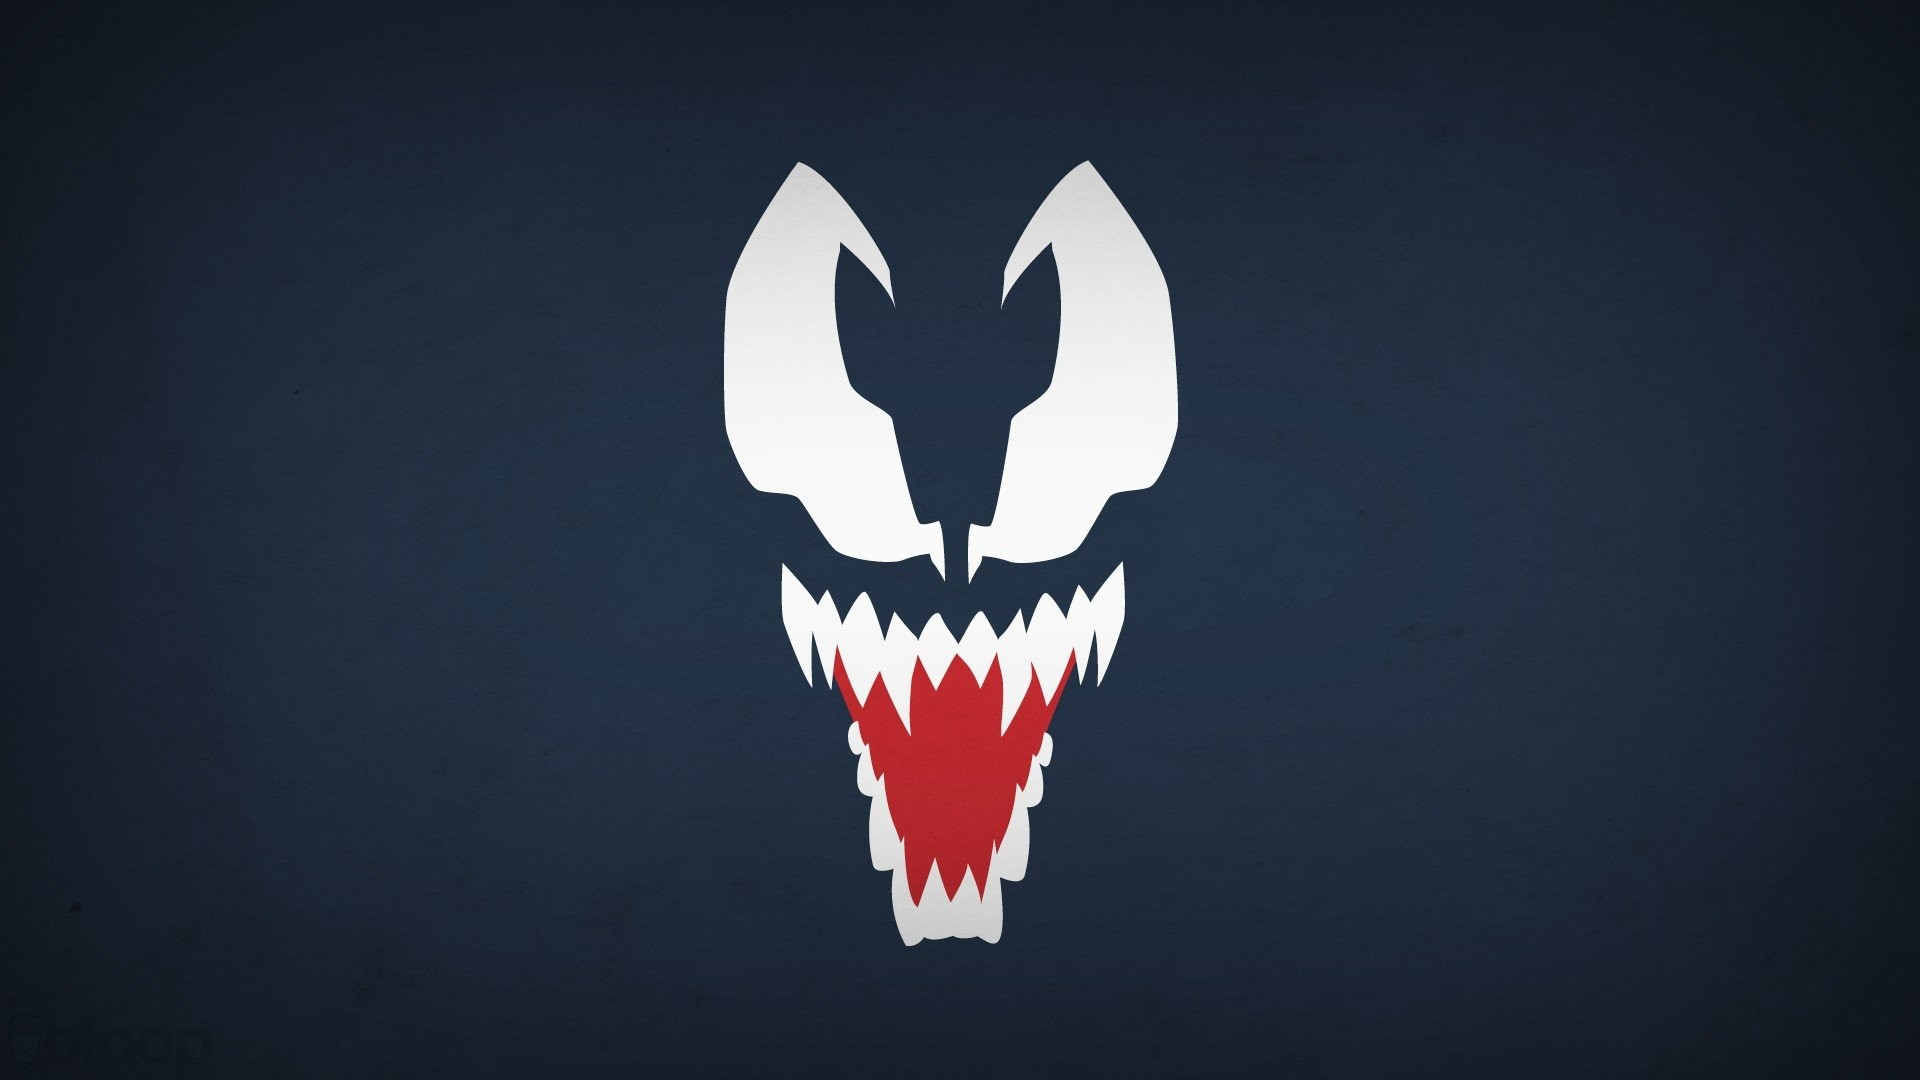 Blo0p Blue Background Marvel Comics Navy Venom Villians